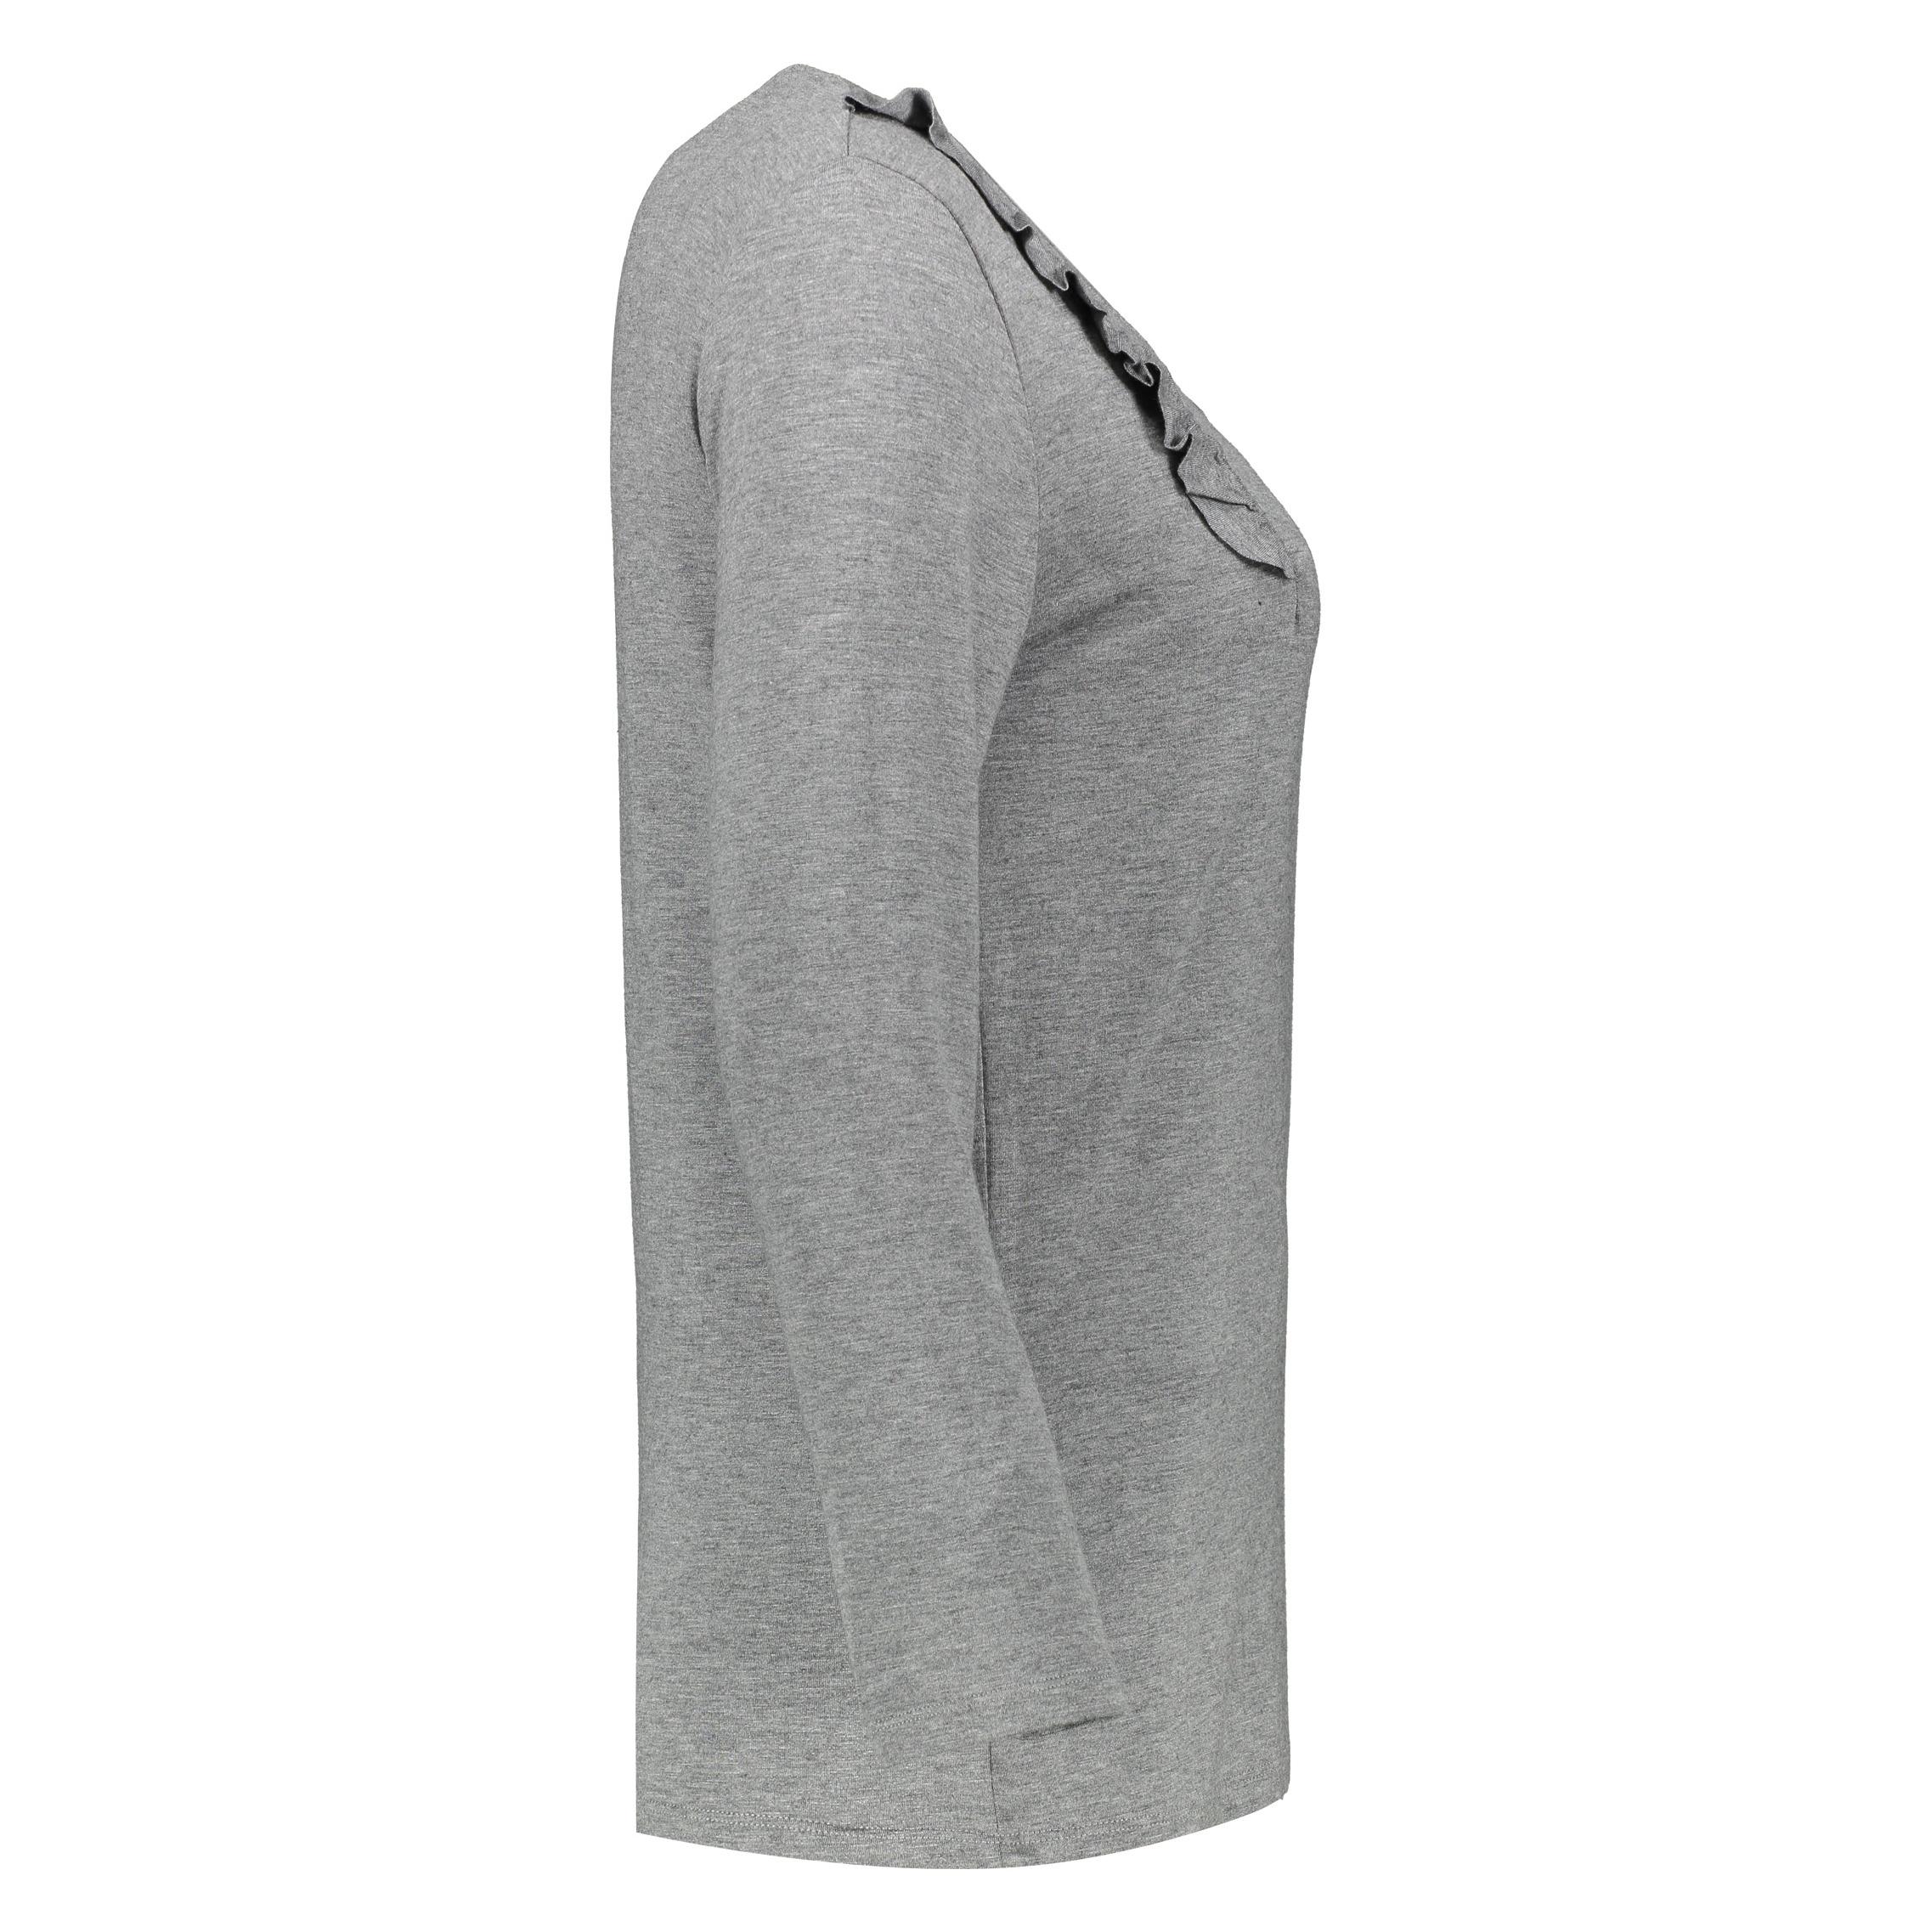 تی شرت نه او وی اس مدل 004817963-GREY